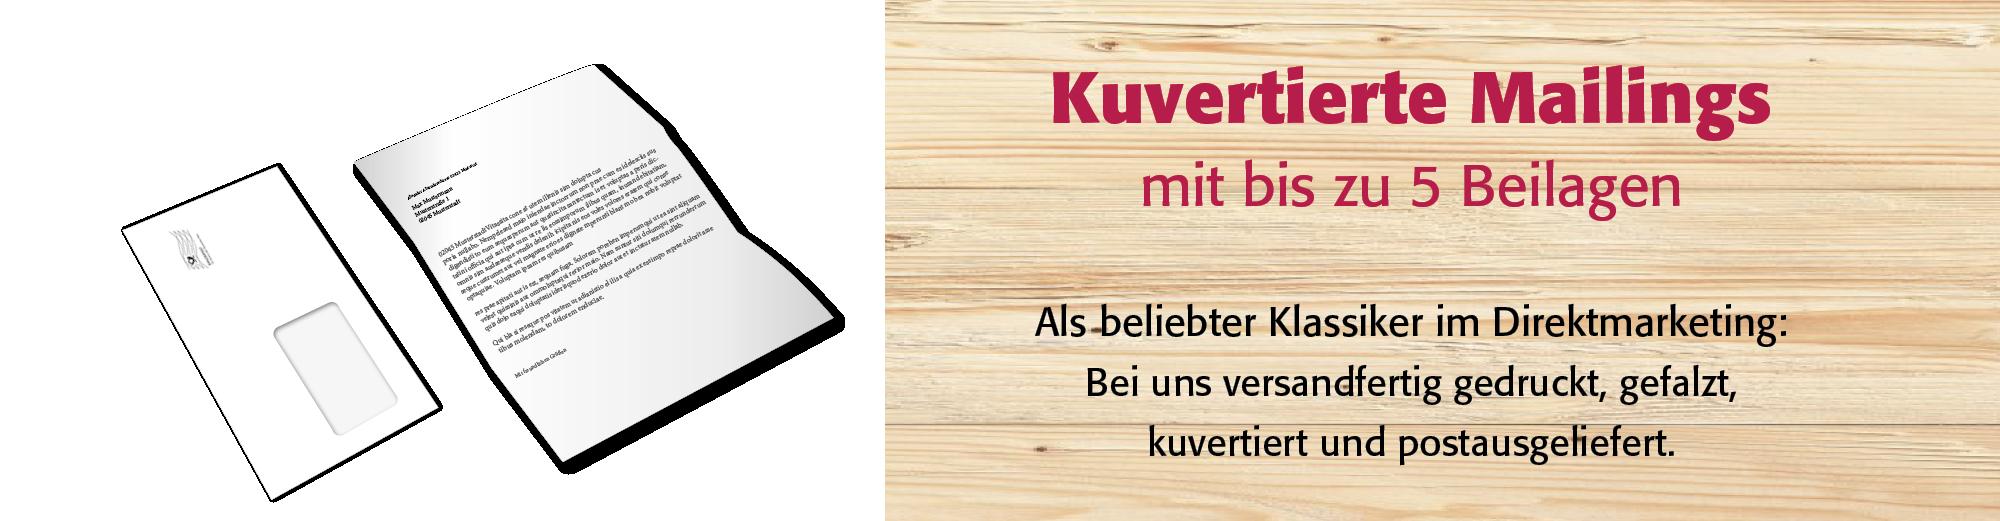 Lettershop_Mailing_Kuvertierte-Mailings